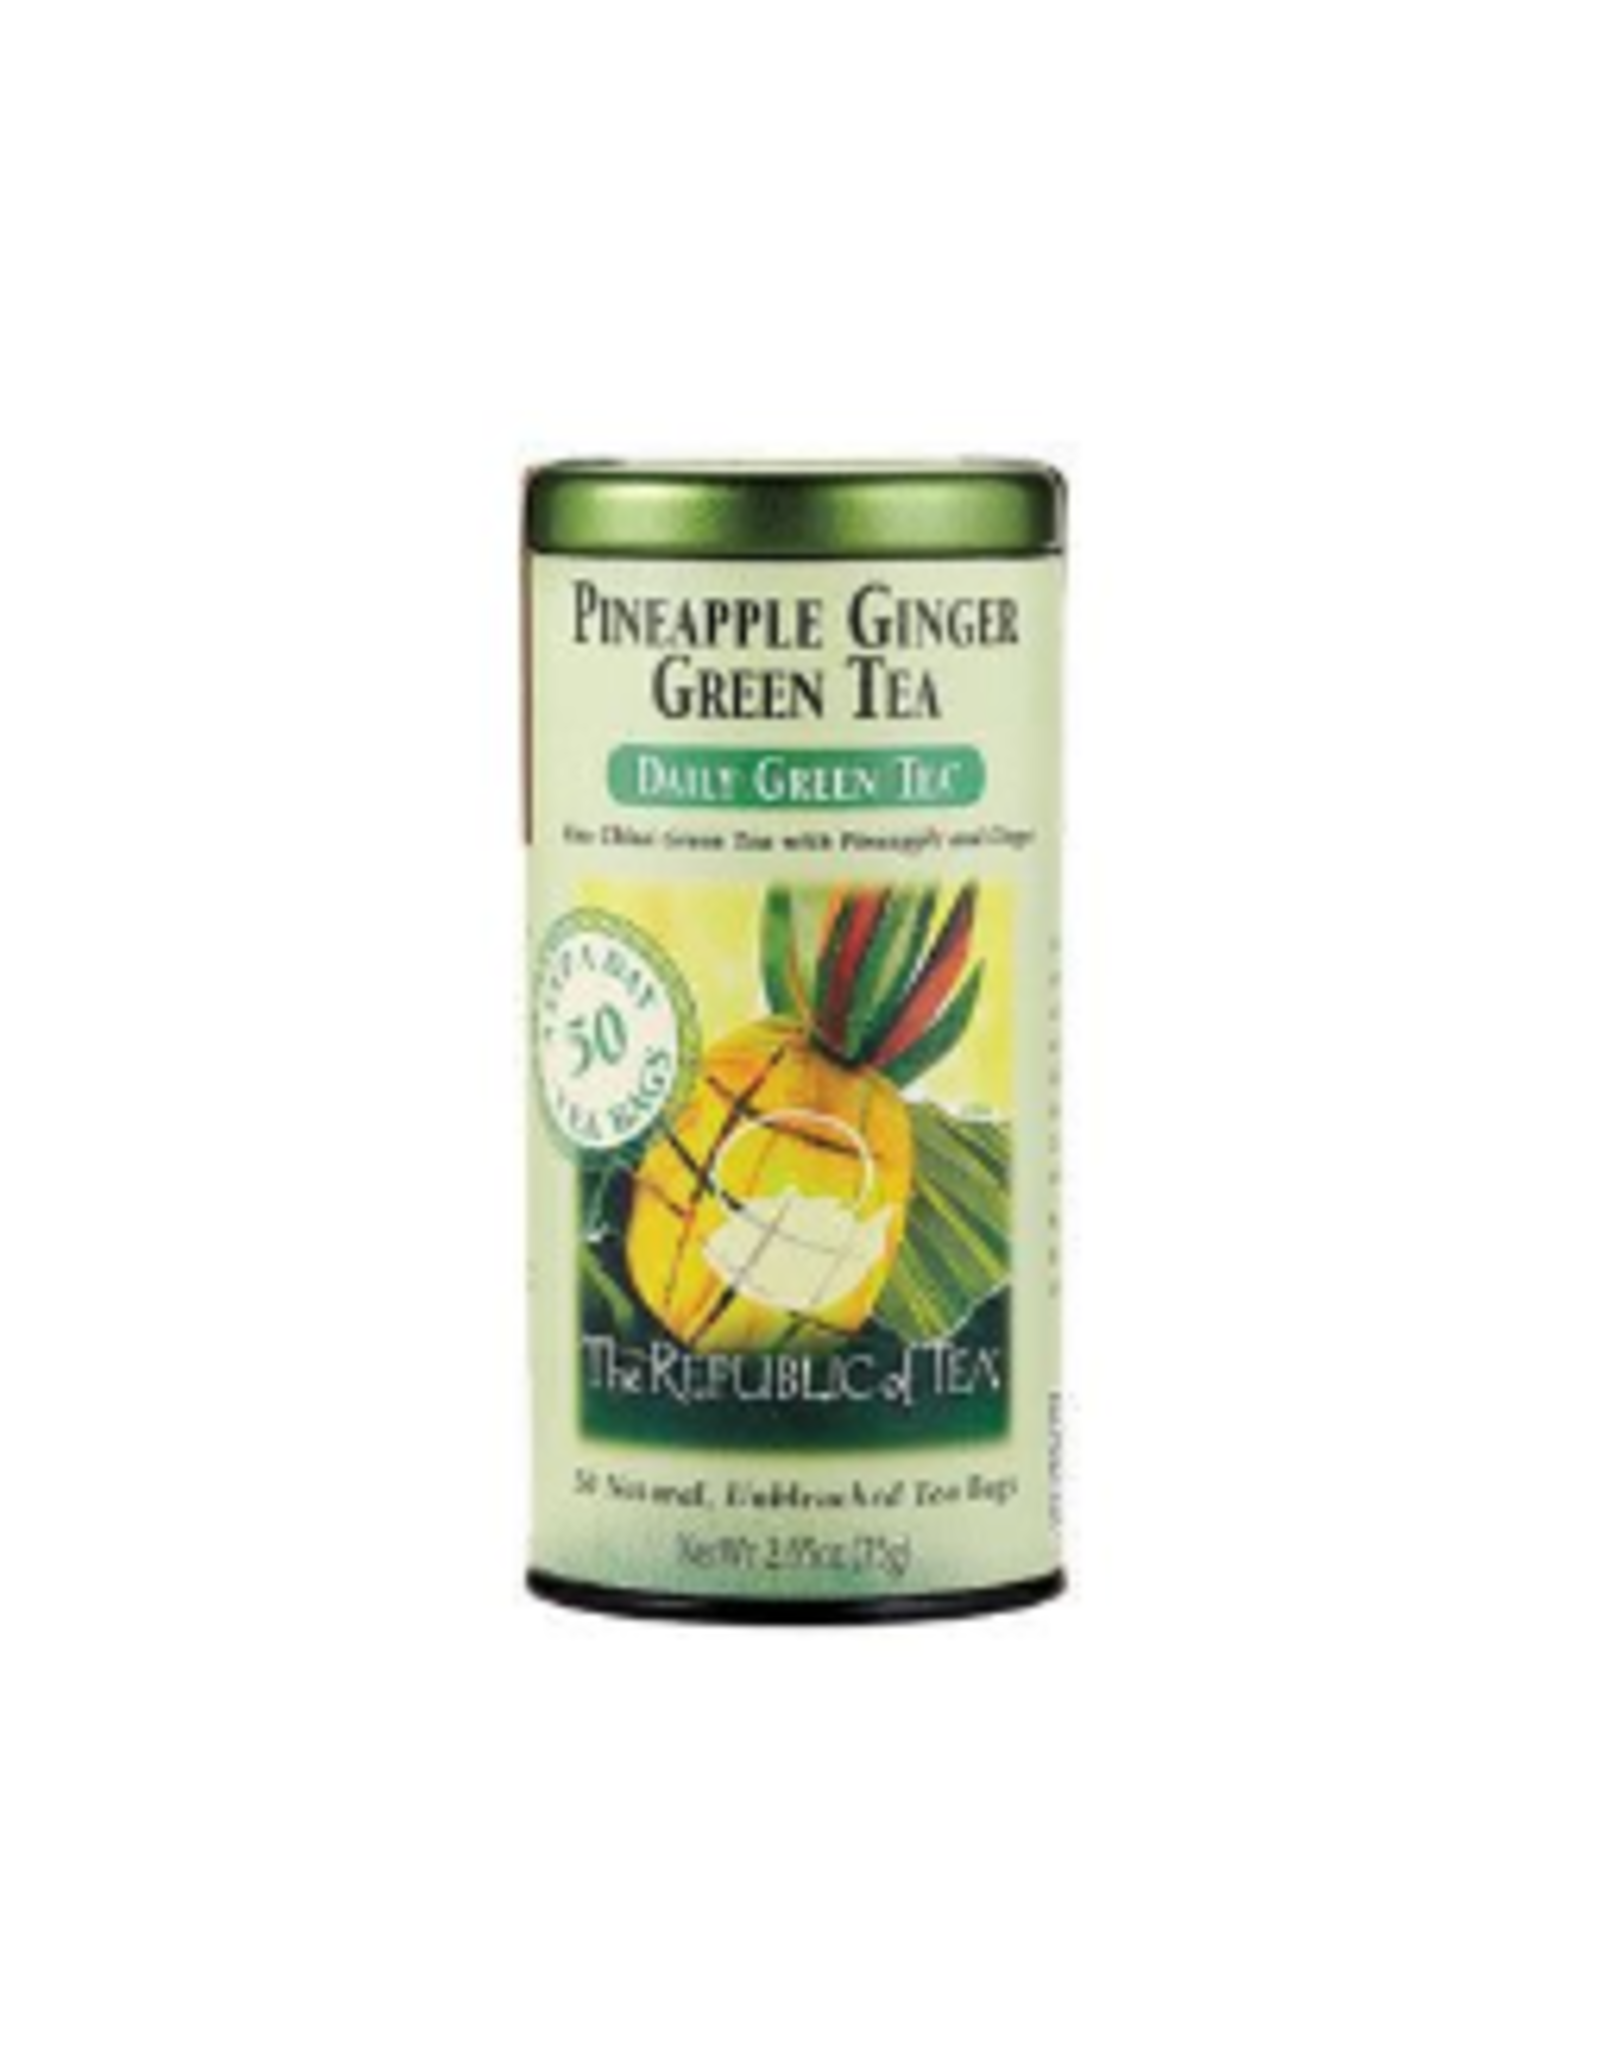 The Republic of Tea Pineapple Ginger Green Tea, 50 Bag Tin